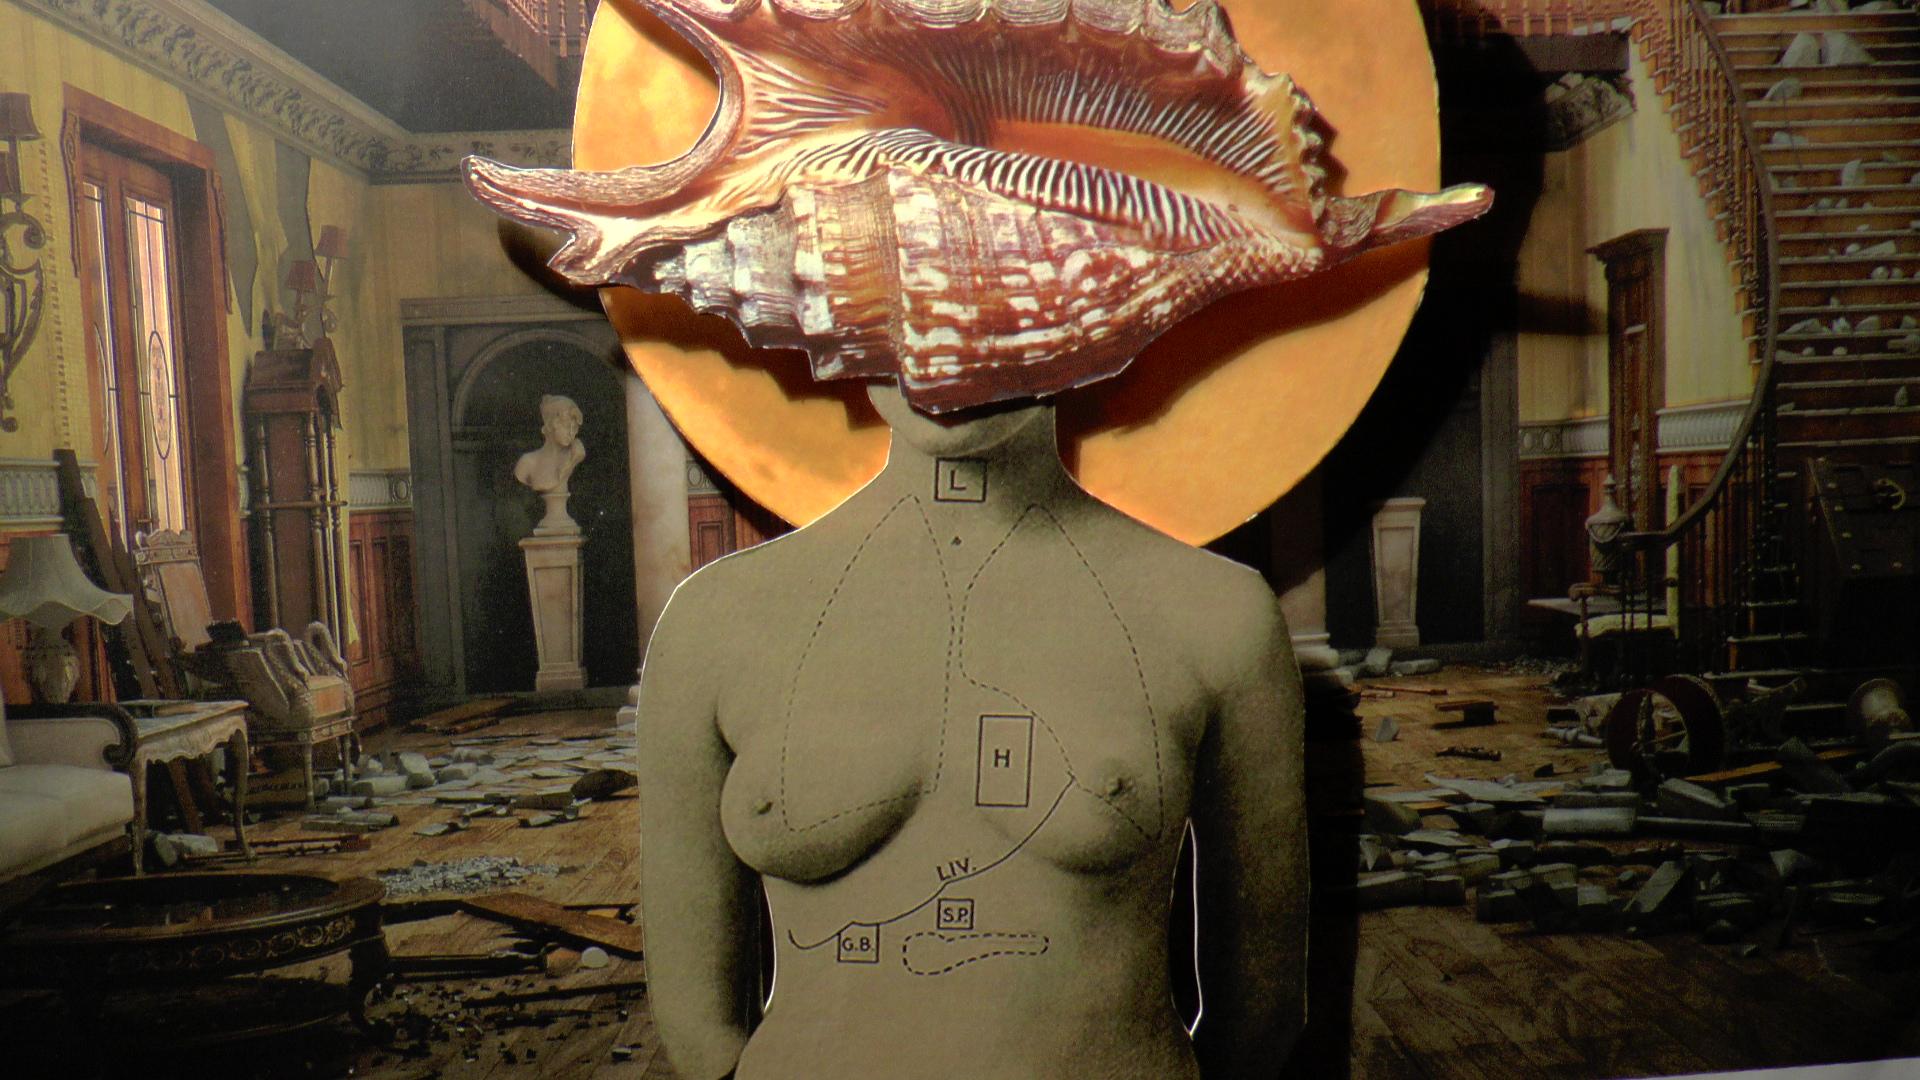 She-shell (2014)